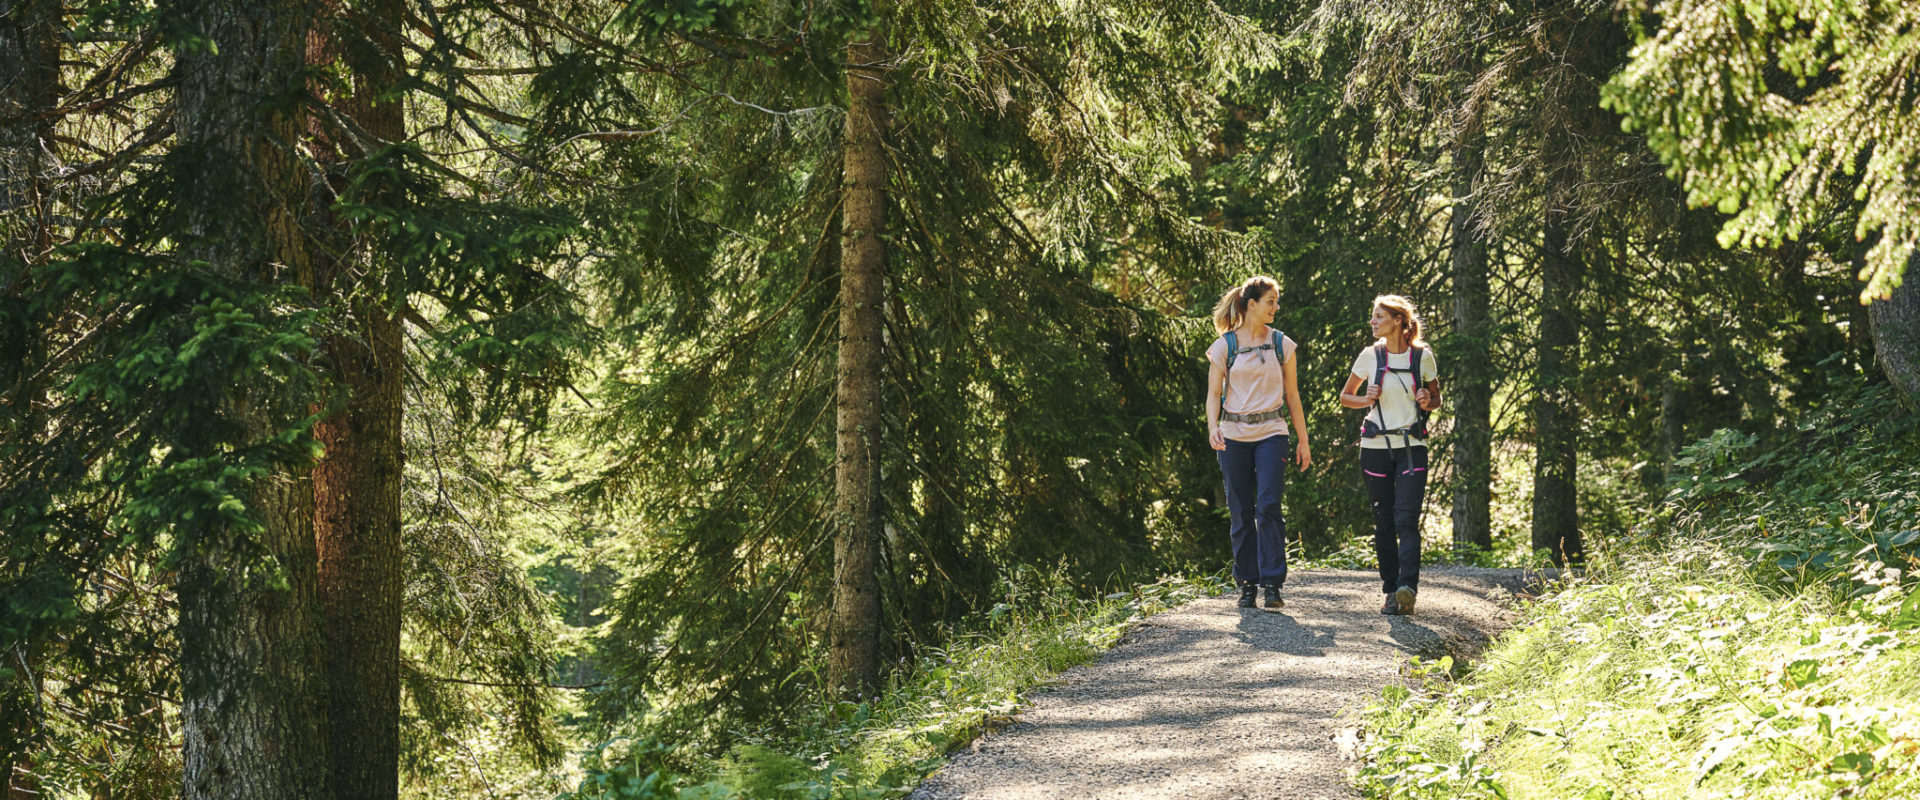 Kulinarisch Wandern - Lingenau-Hittisau